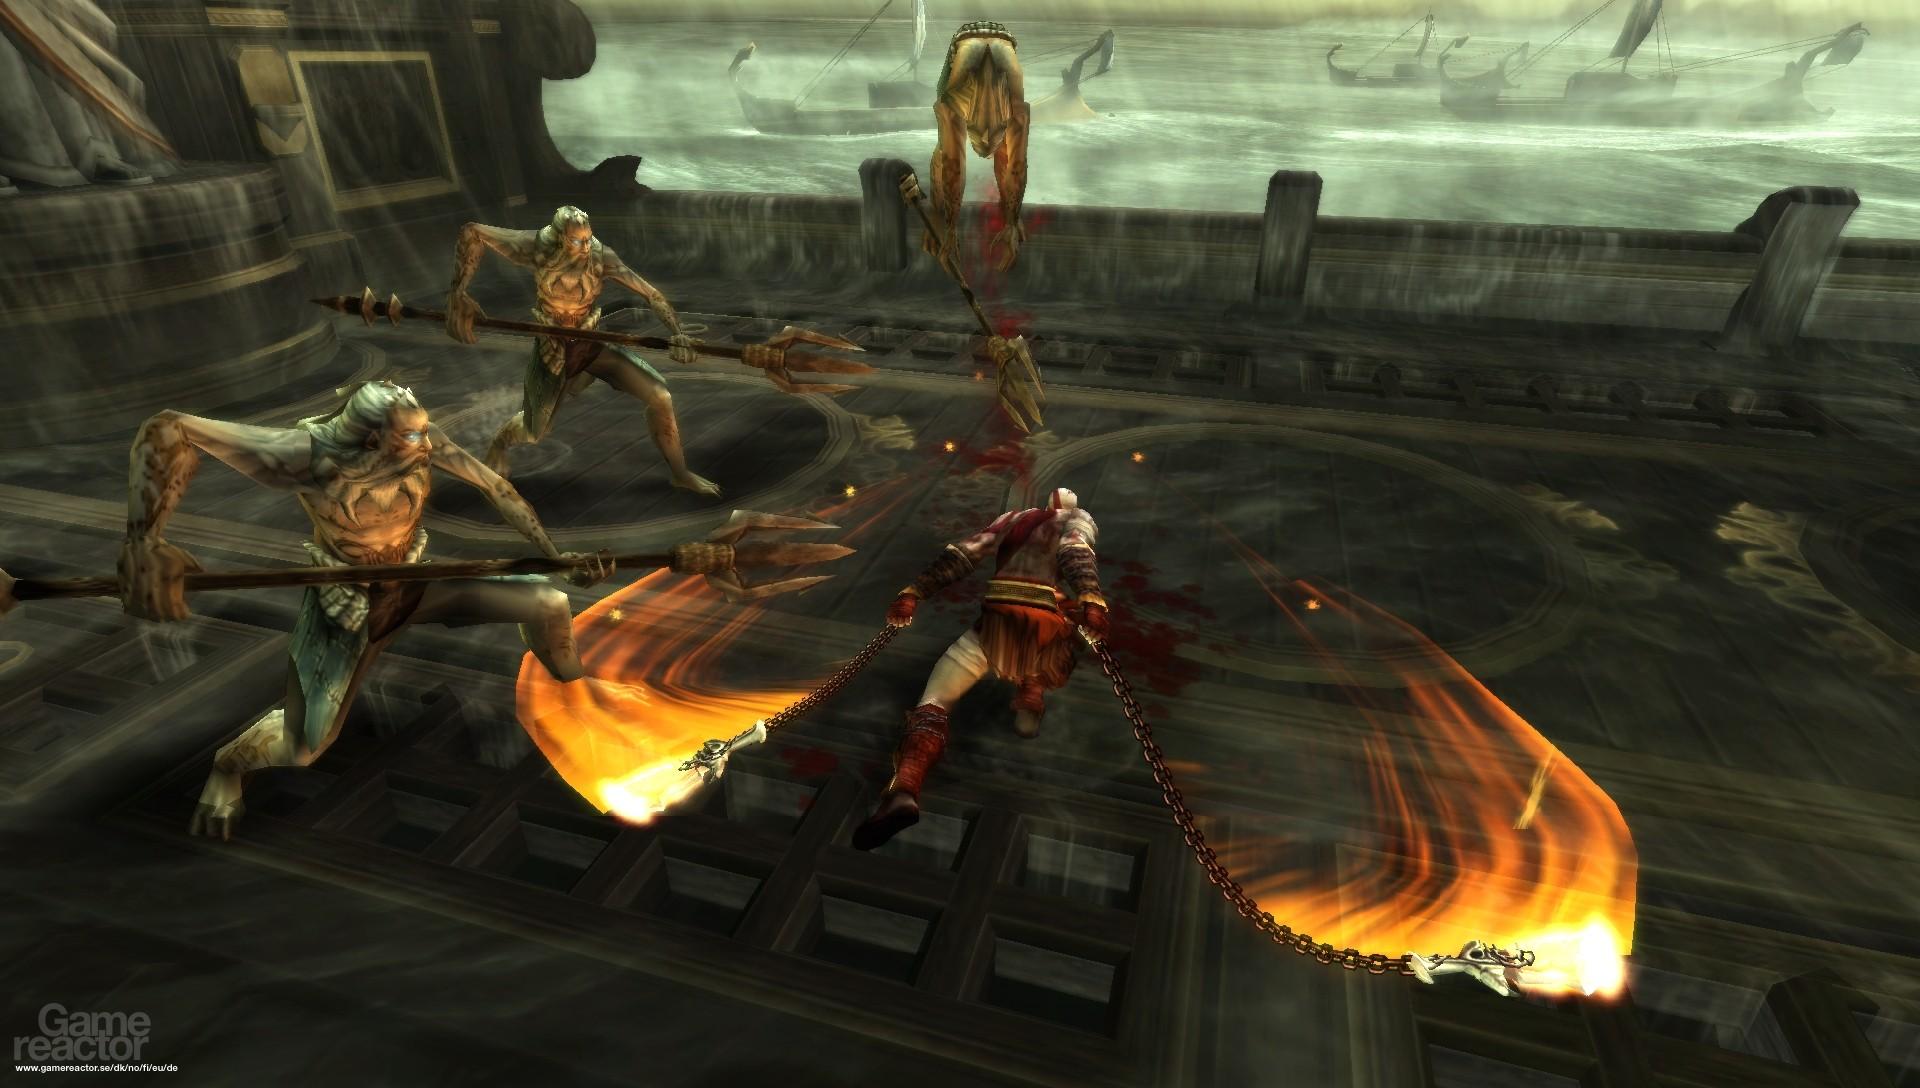 Imagens de God of War: Ghost of Sparta 24/30